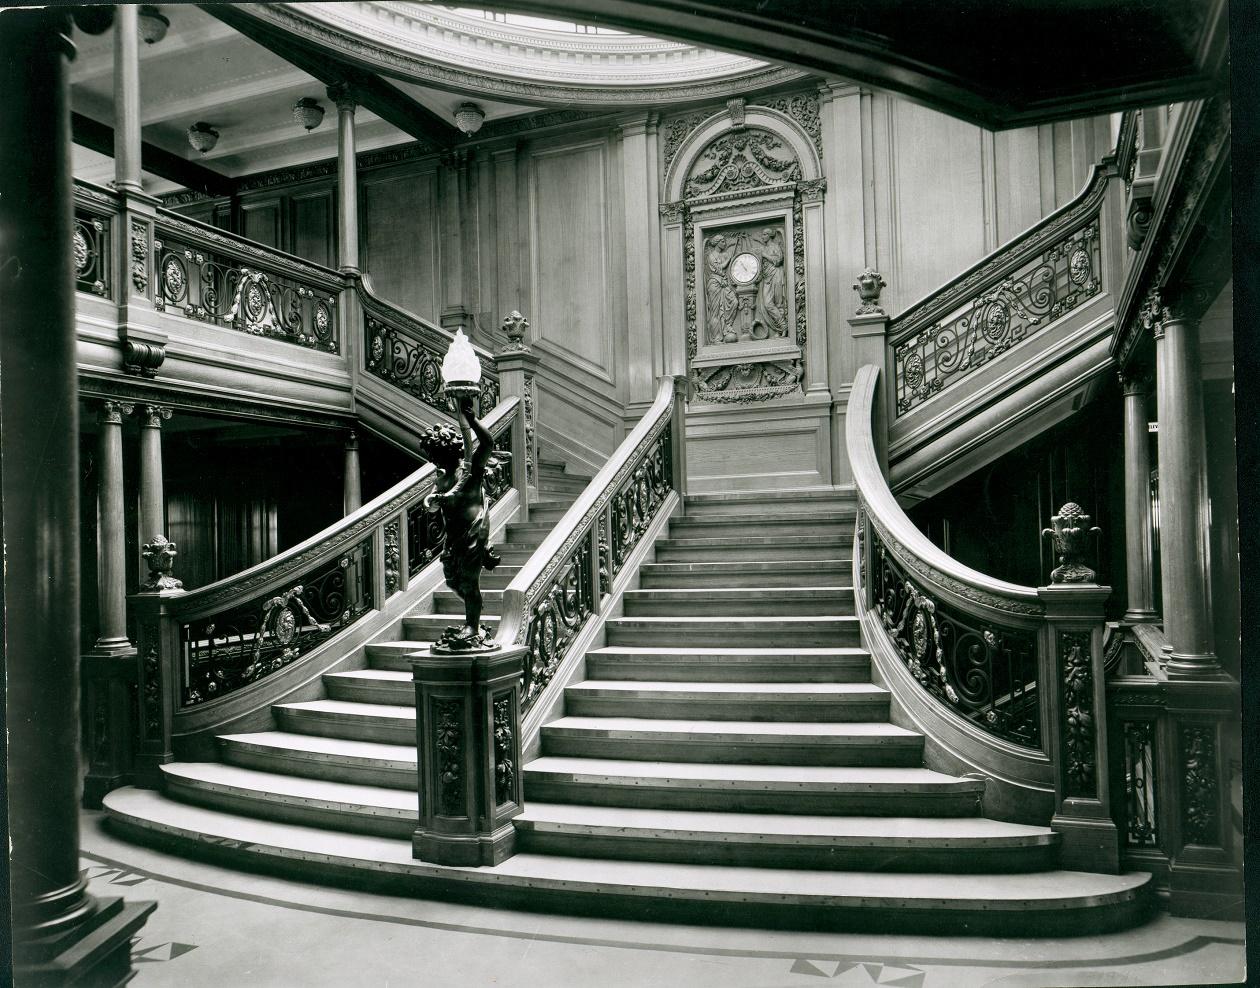 copyright Claes Göran Wetterholm/mat. pras. Titanic, the Exhibition